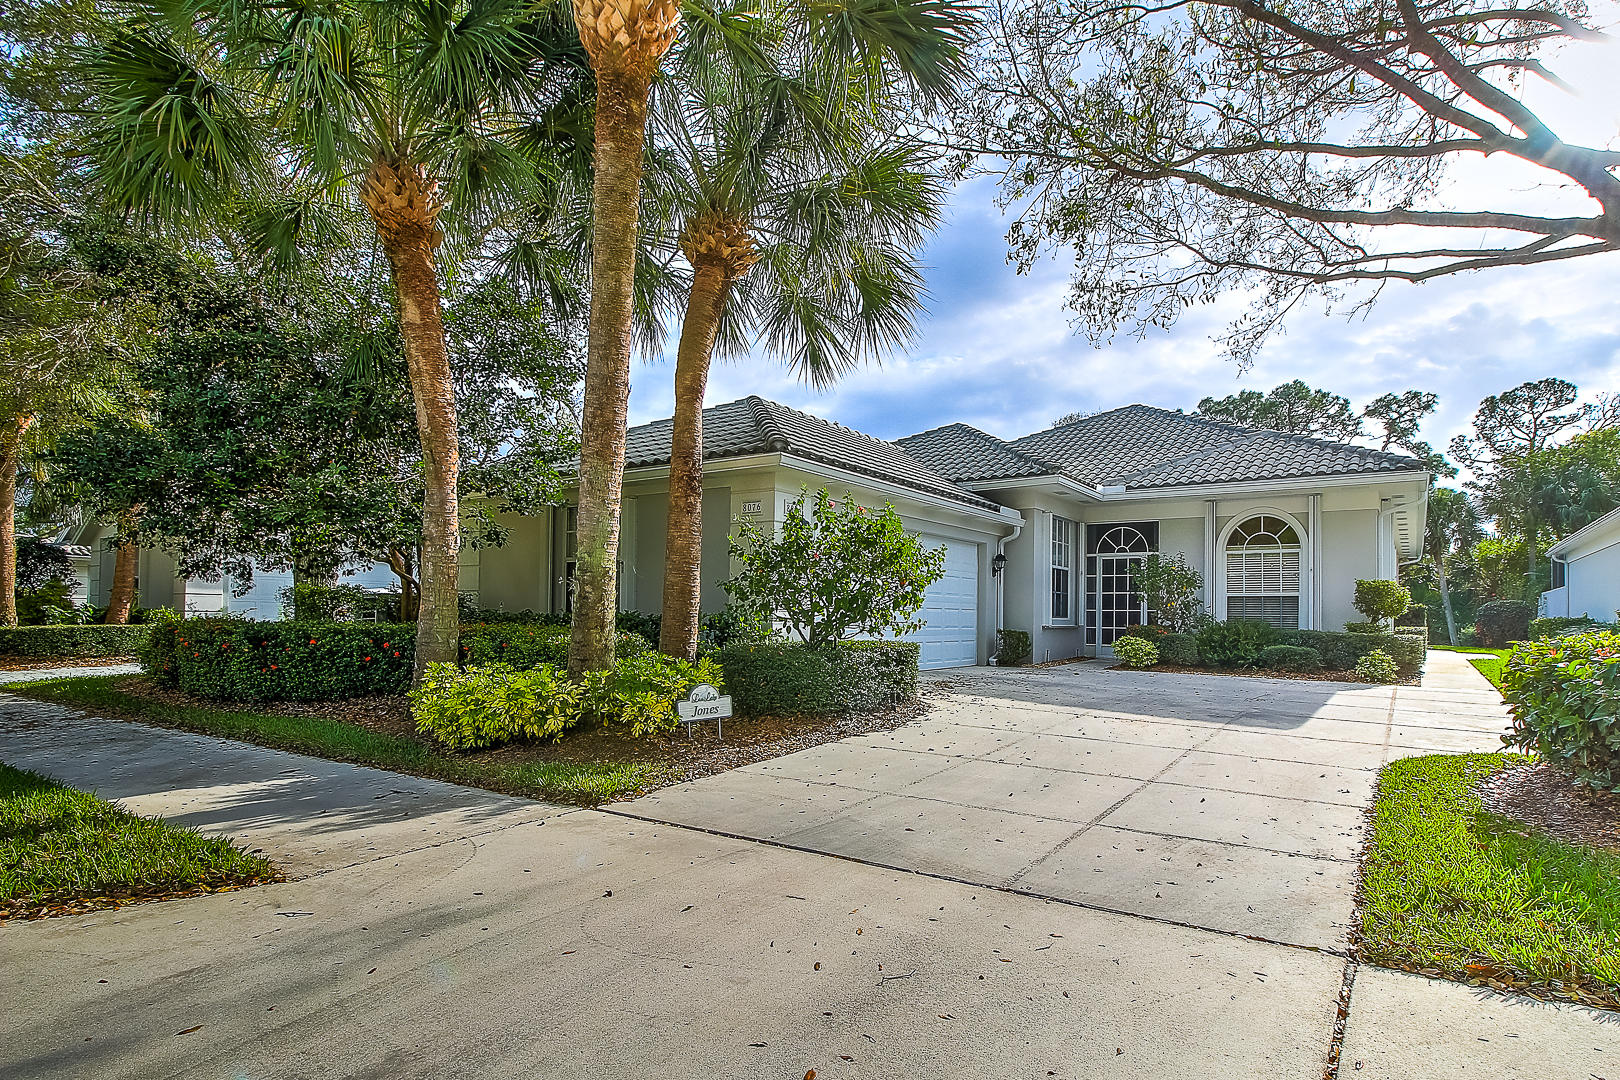 8076 Double Tree Drive, Hobe Sound, Florida 33455, 3 Bedrooms Bedrooms, ,2.1 BathroomsBathrooms,A,Single family,Double Tree,RX-10507982